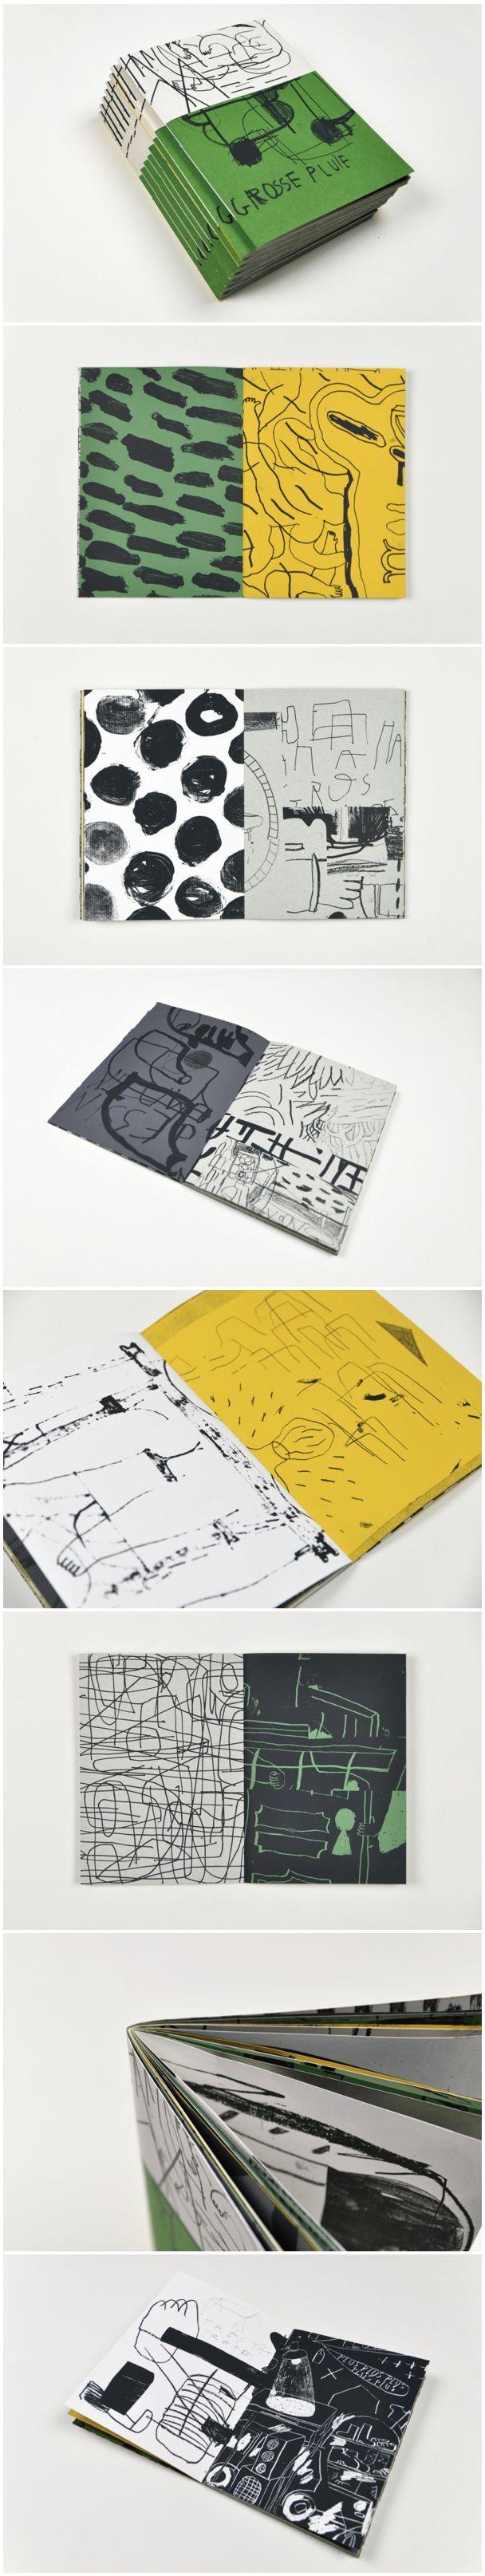 Grosse pluie   Screen printed book by Marion Jdanoff and Damien Tran